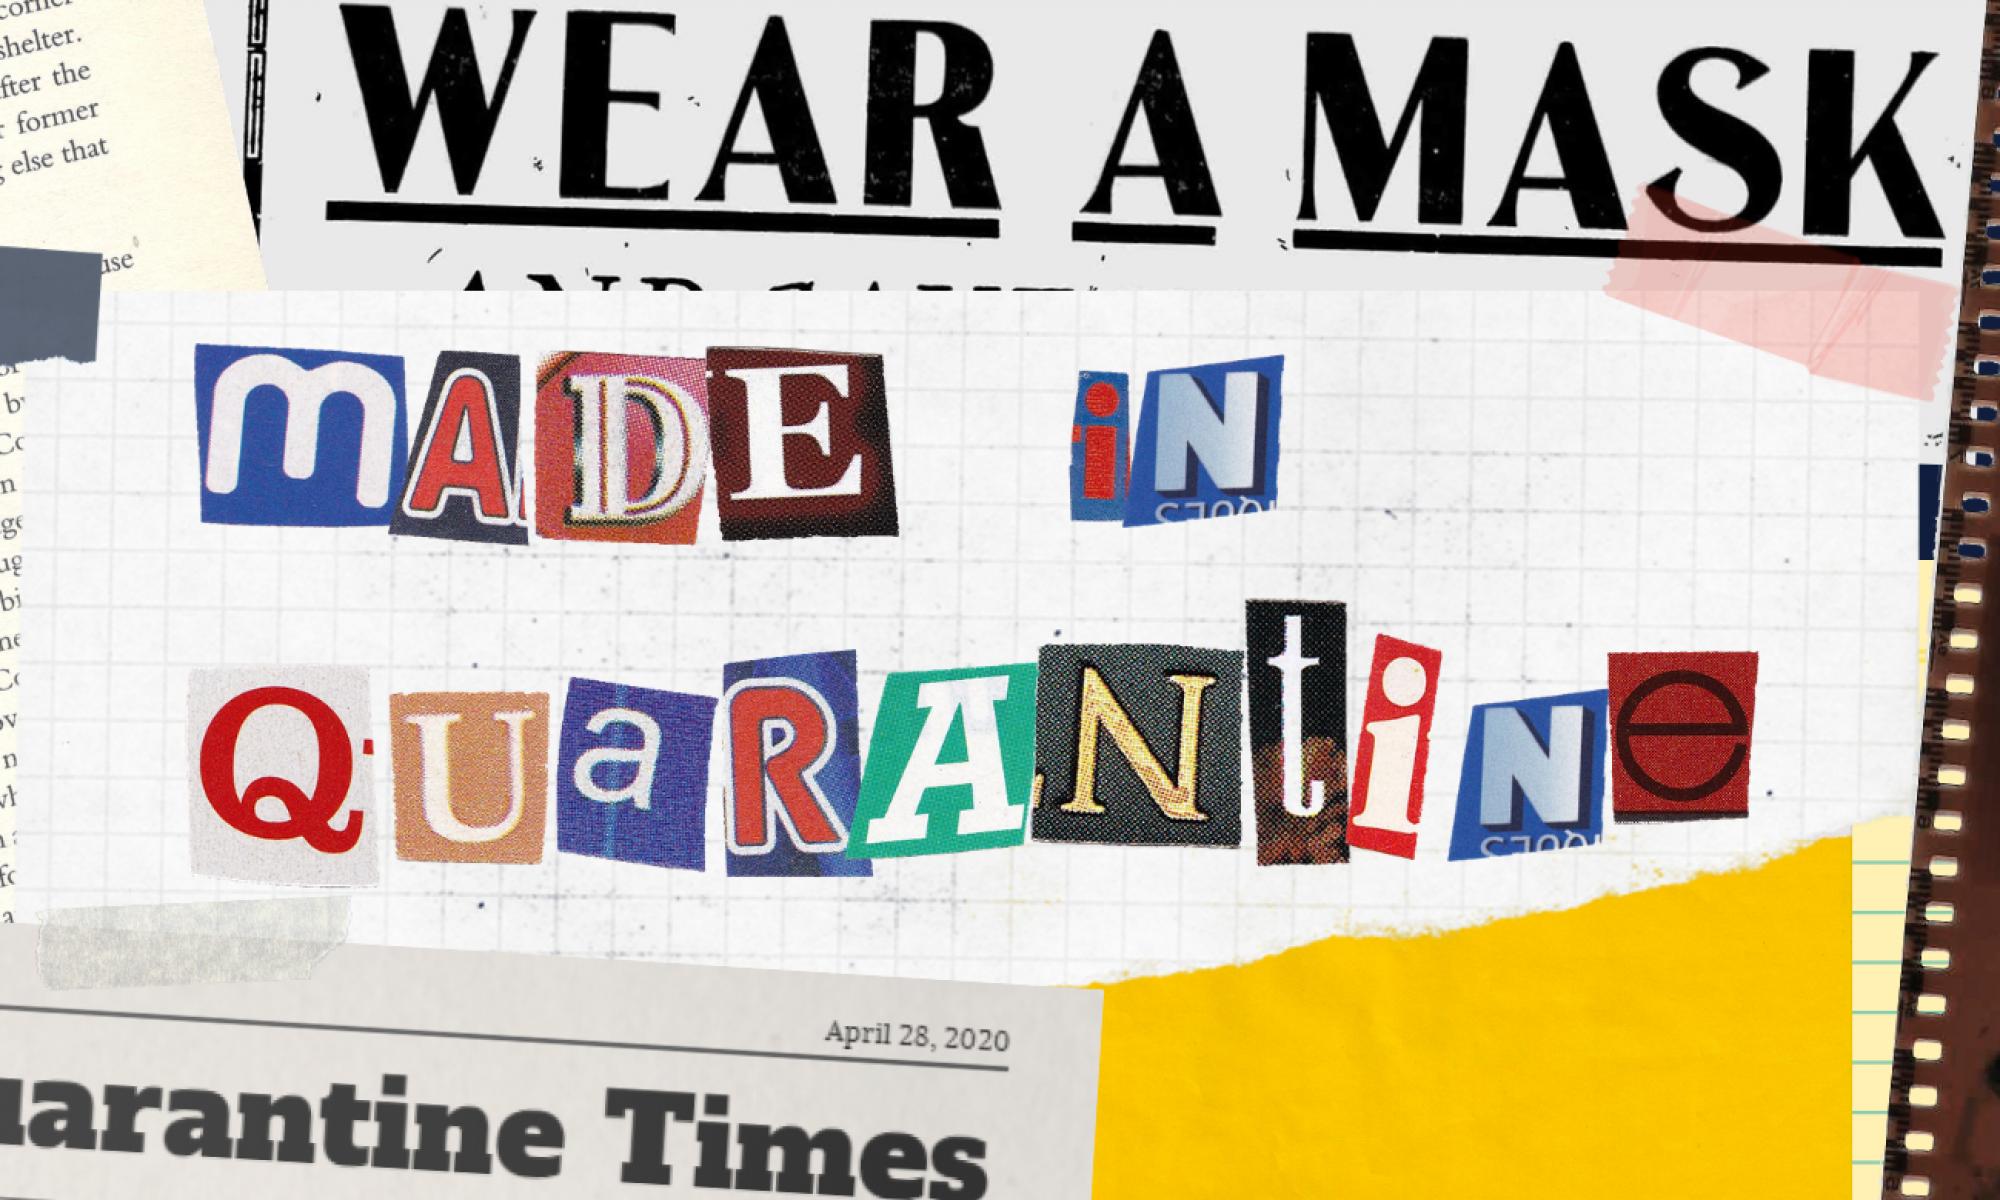 Made in Quarantine